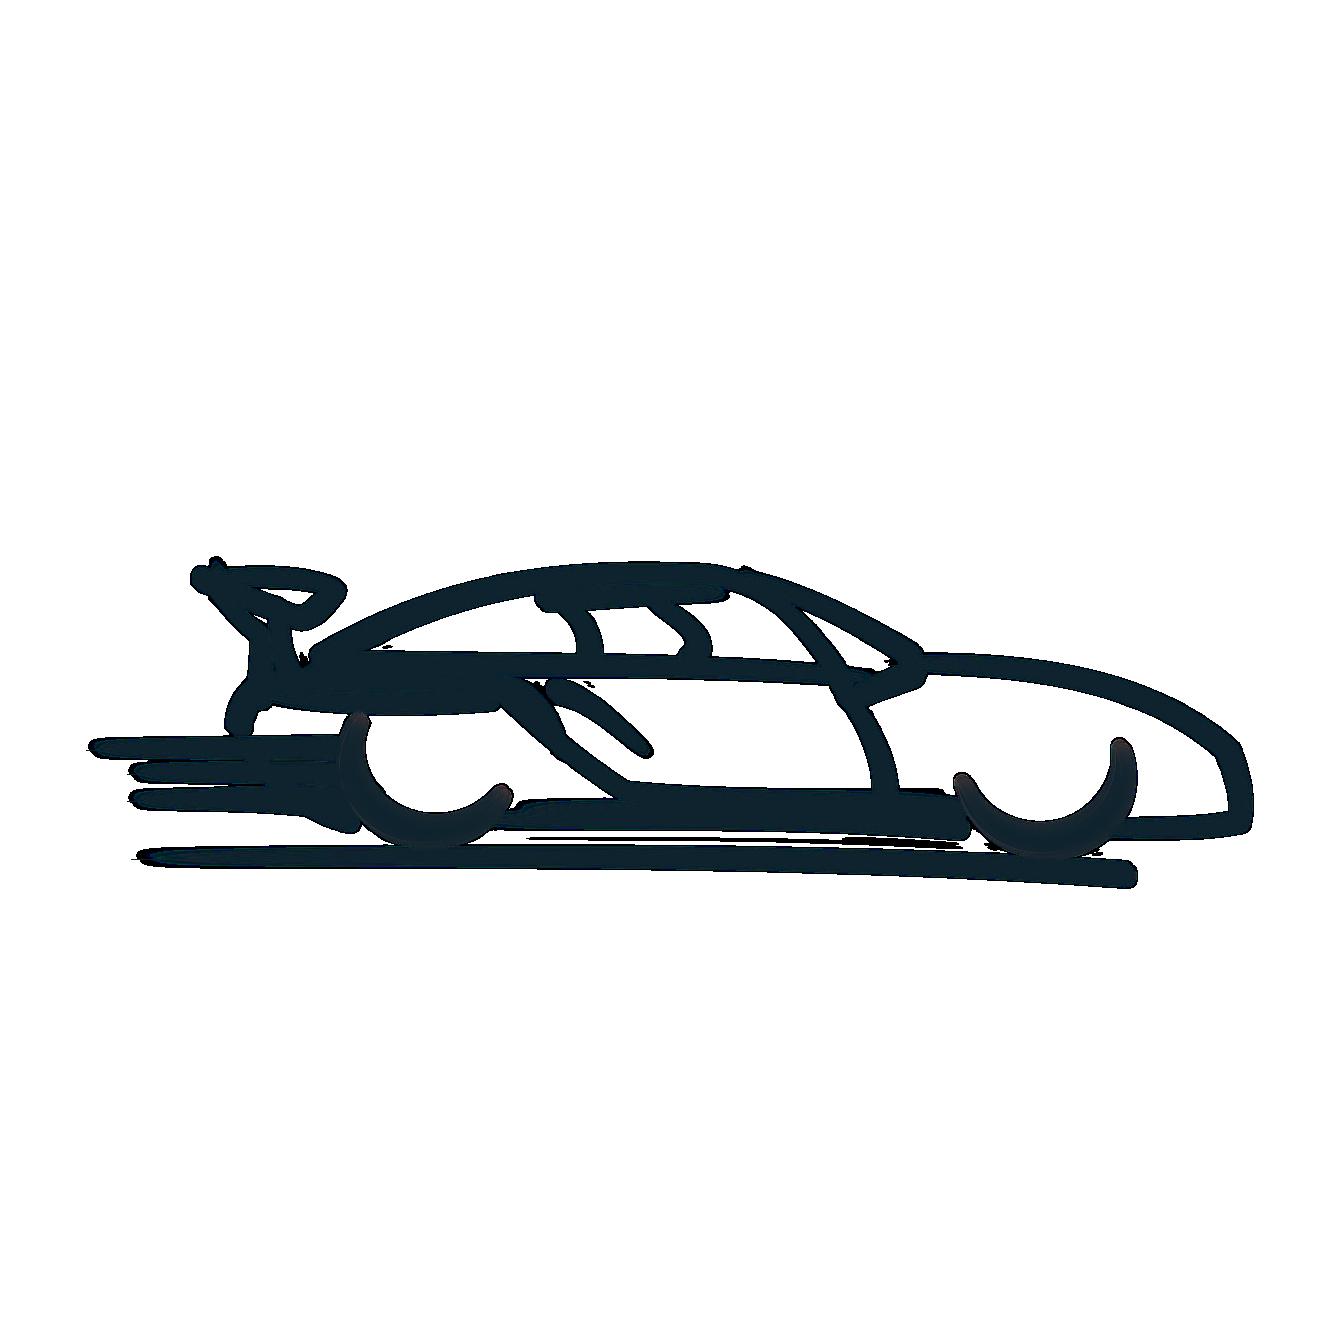 Line Art Website : Car line art cliparts